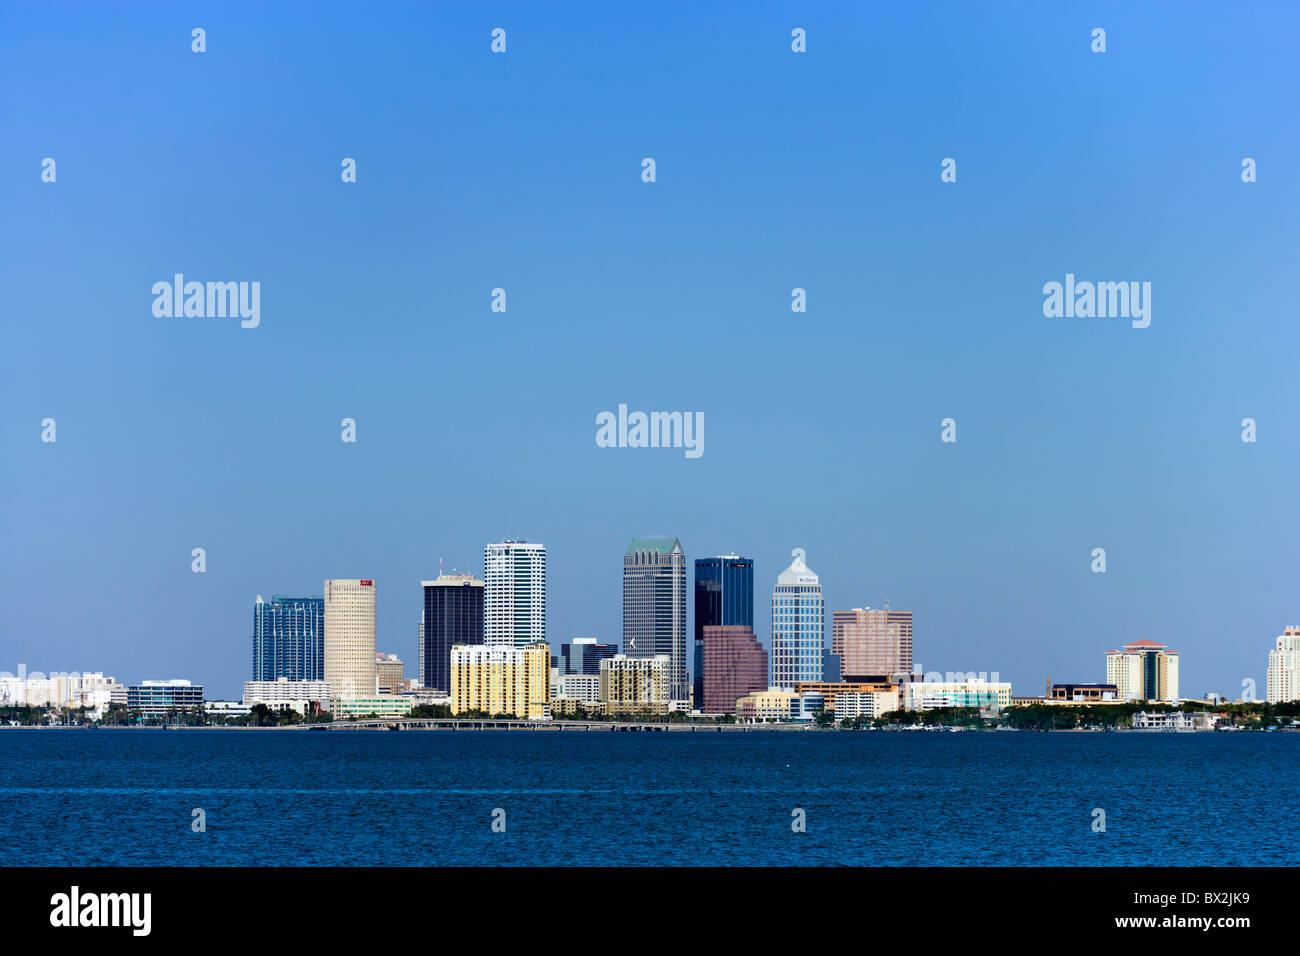 The city skyline across Tampa Bay from Ballast Point Park, Interbay Peninsula, Tampa, Florida, USA - Stock Image